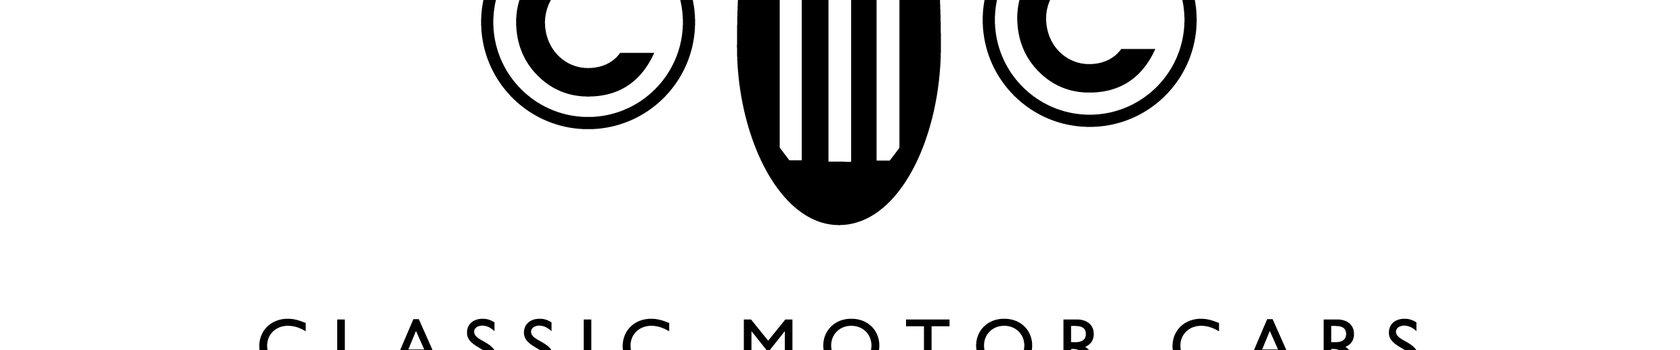 Cmc Logo Black Strap Line